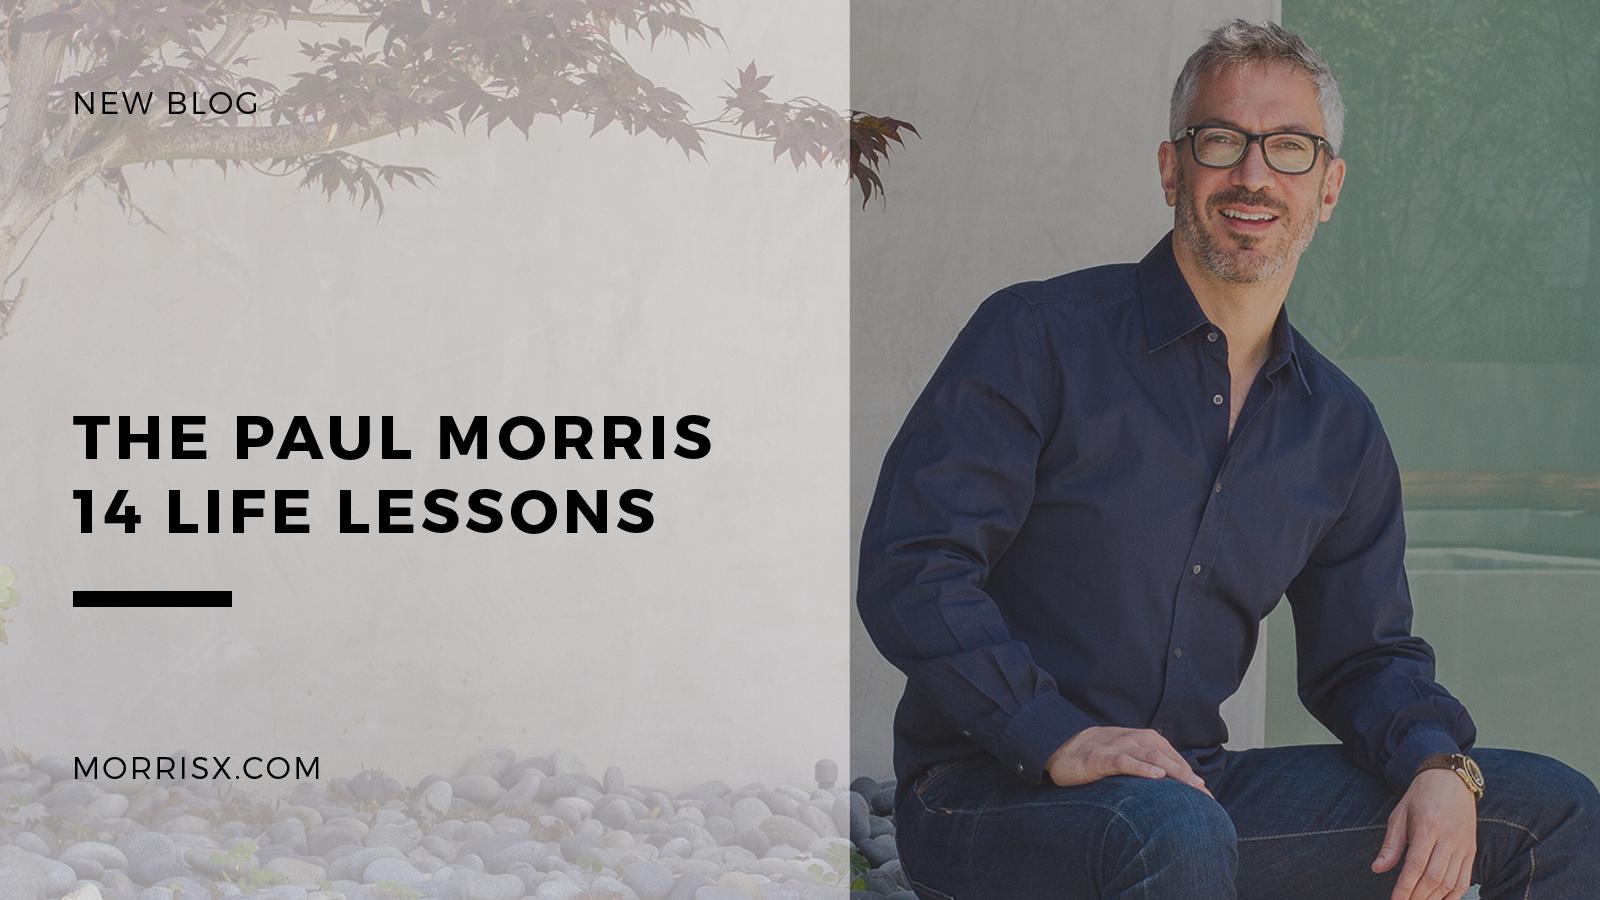 The Paul Morris 14 Life Lessons